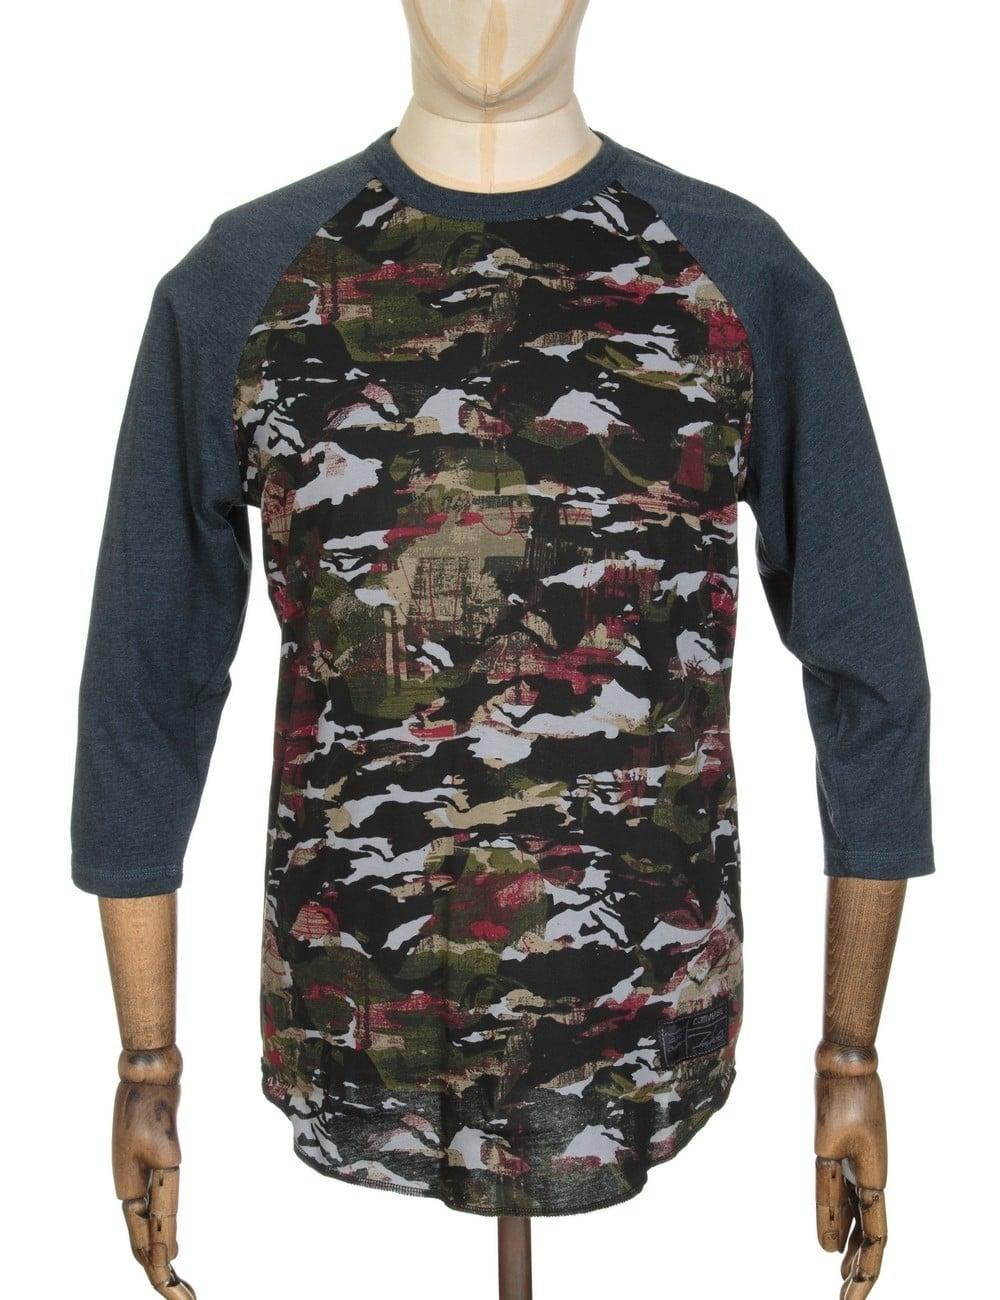 0dc8b95b87c4ea Converse x Futura 1 Raglan Placeholder T-shirt - Black Camo ...